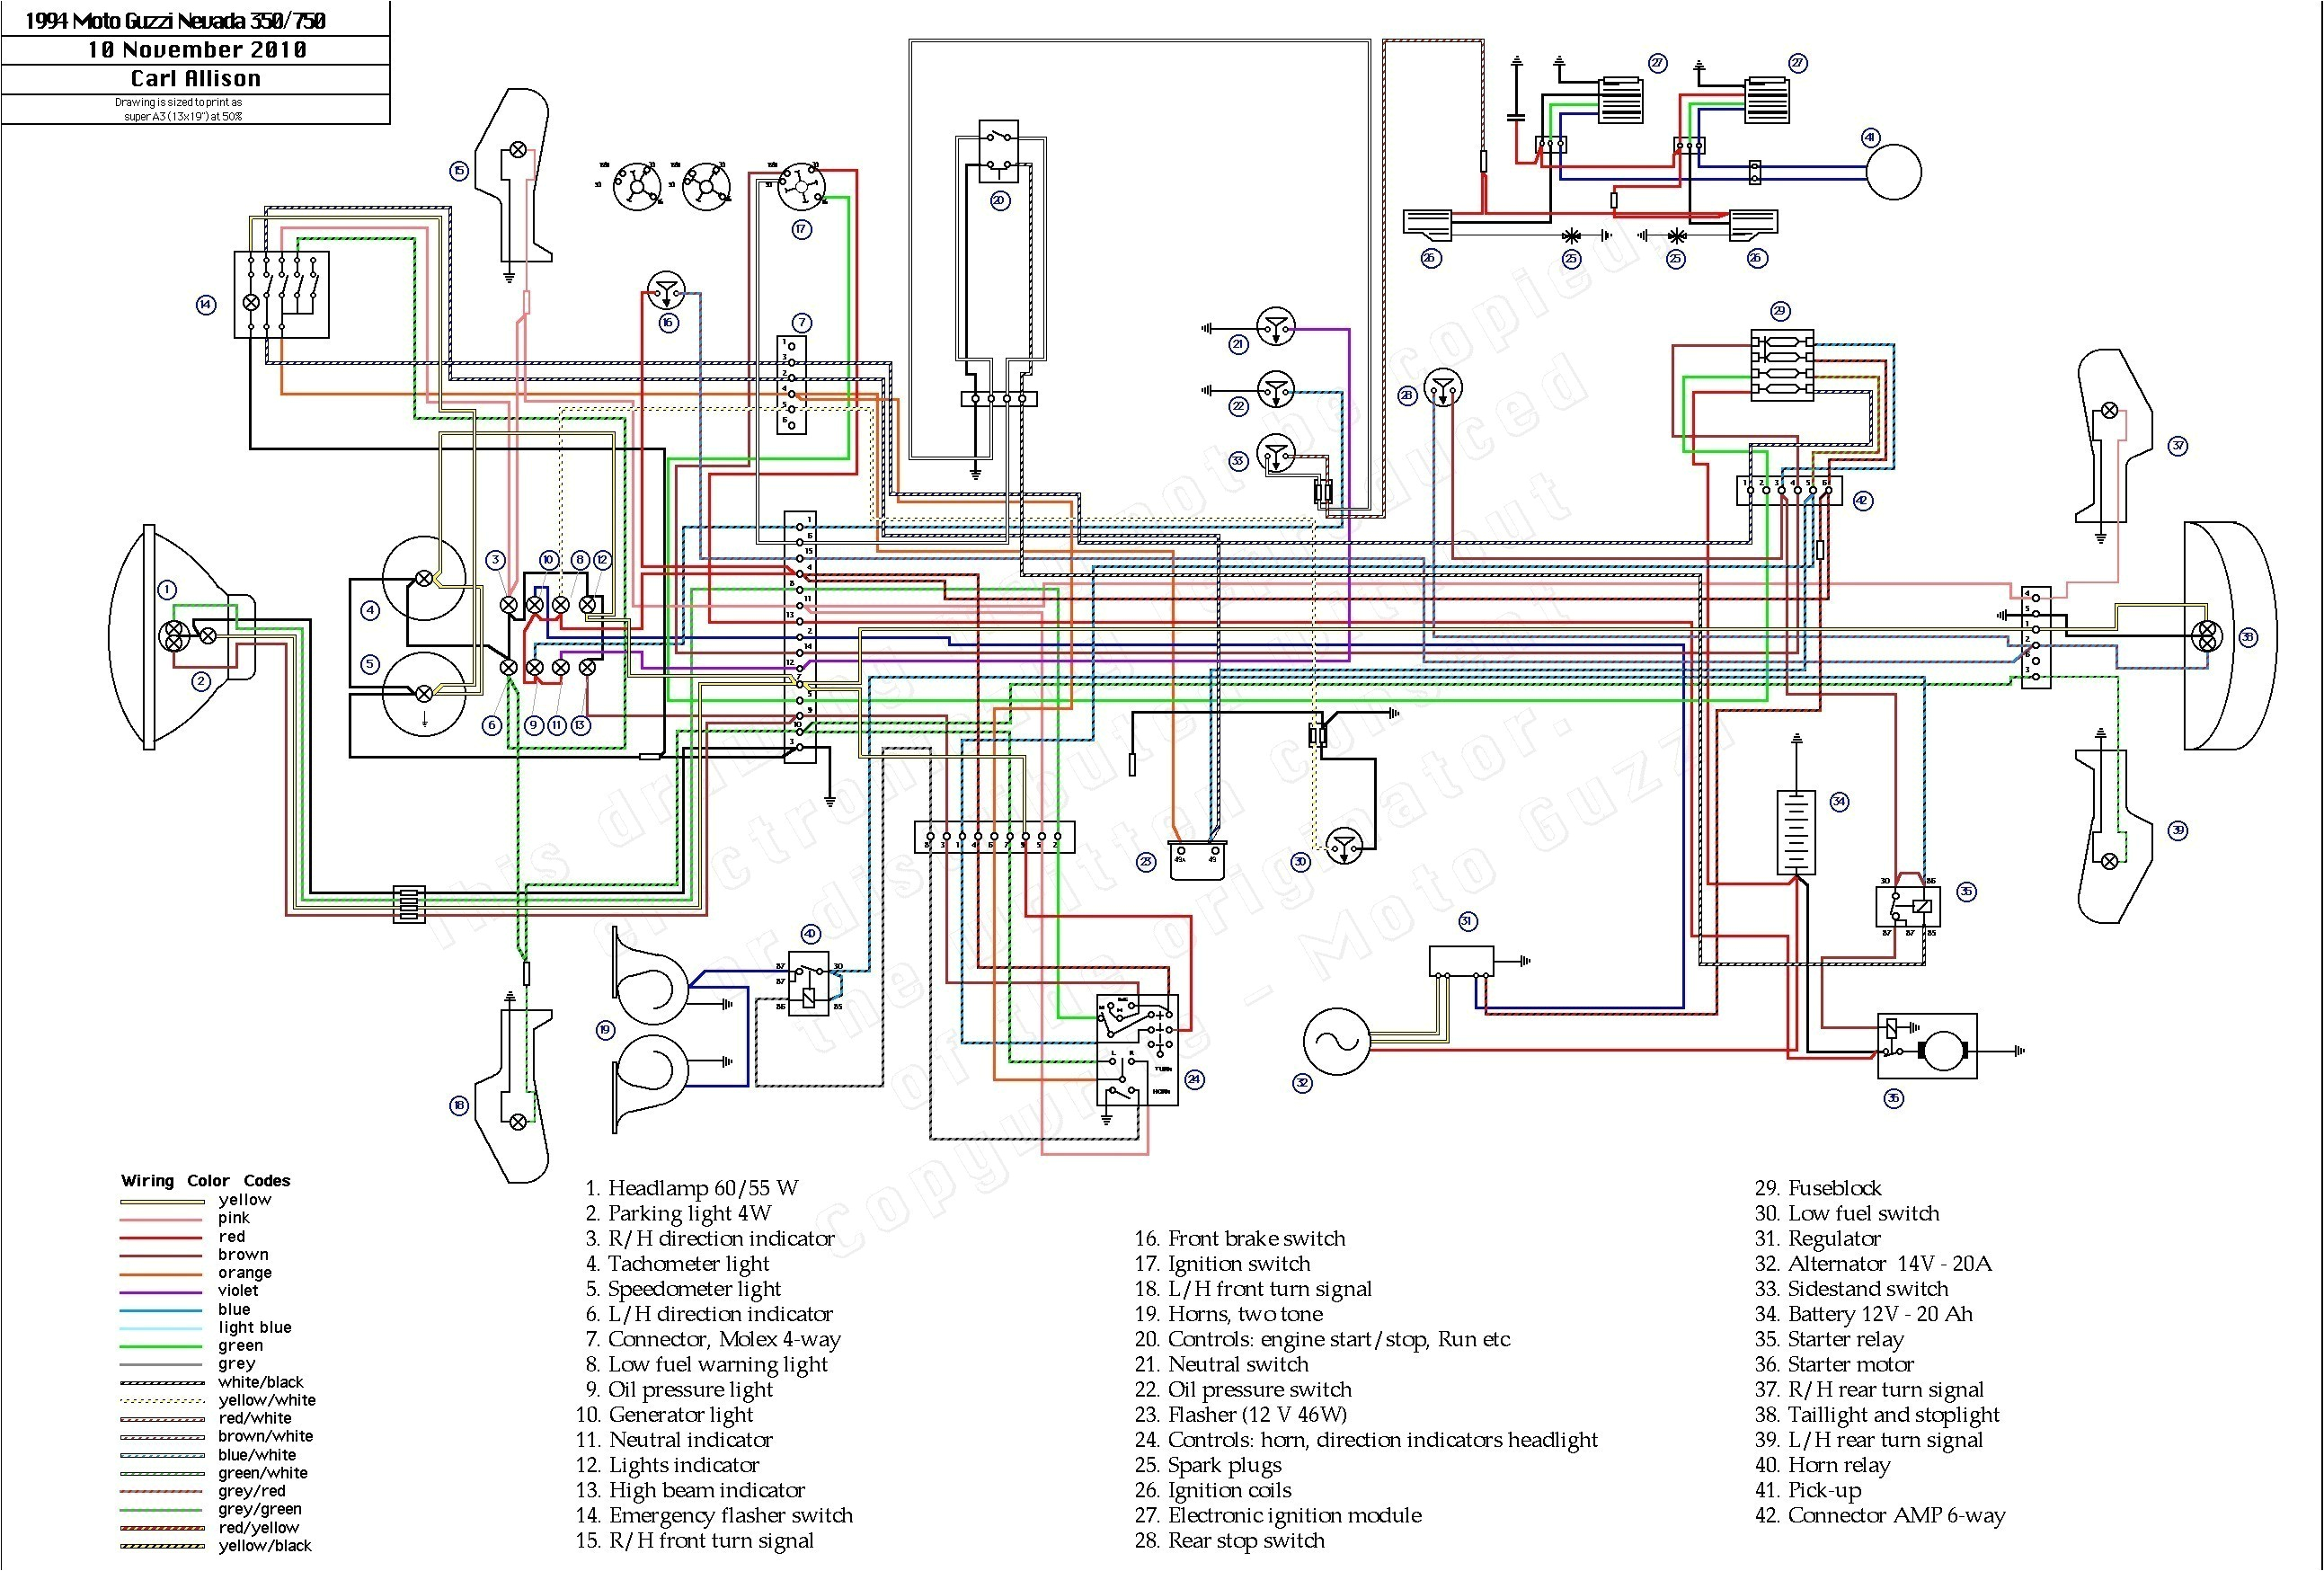 bmw wiring diagram system v12 3 wiring diagrams bmw wiring diagram system bmw wiring diagram system